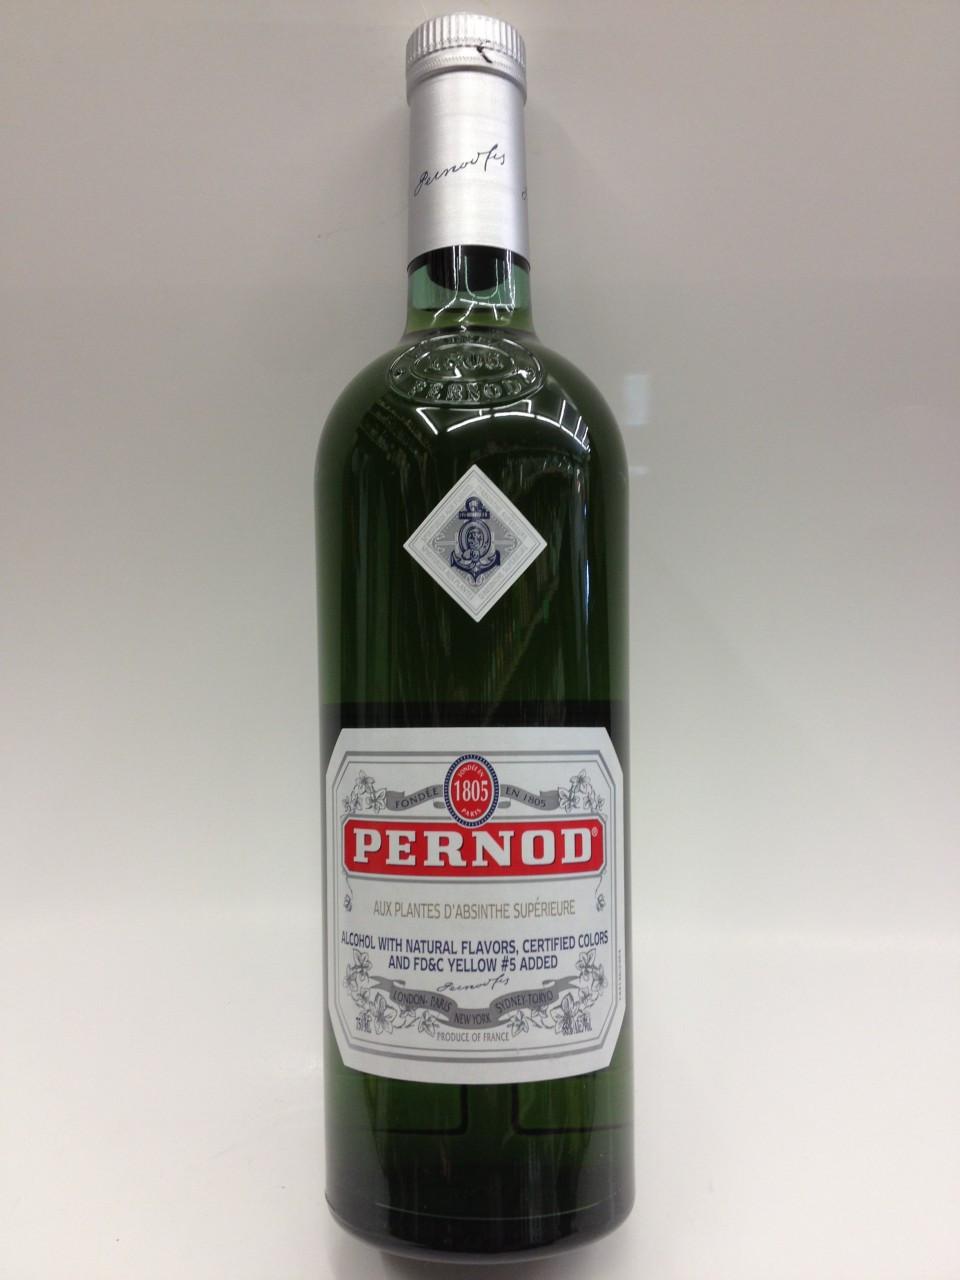 Pernod Absinthe 136 750ml Quality Liquor Store